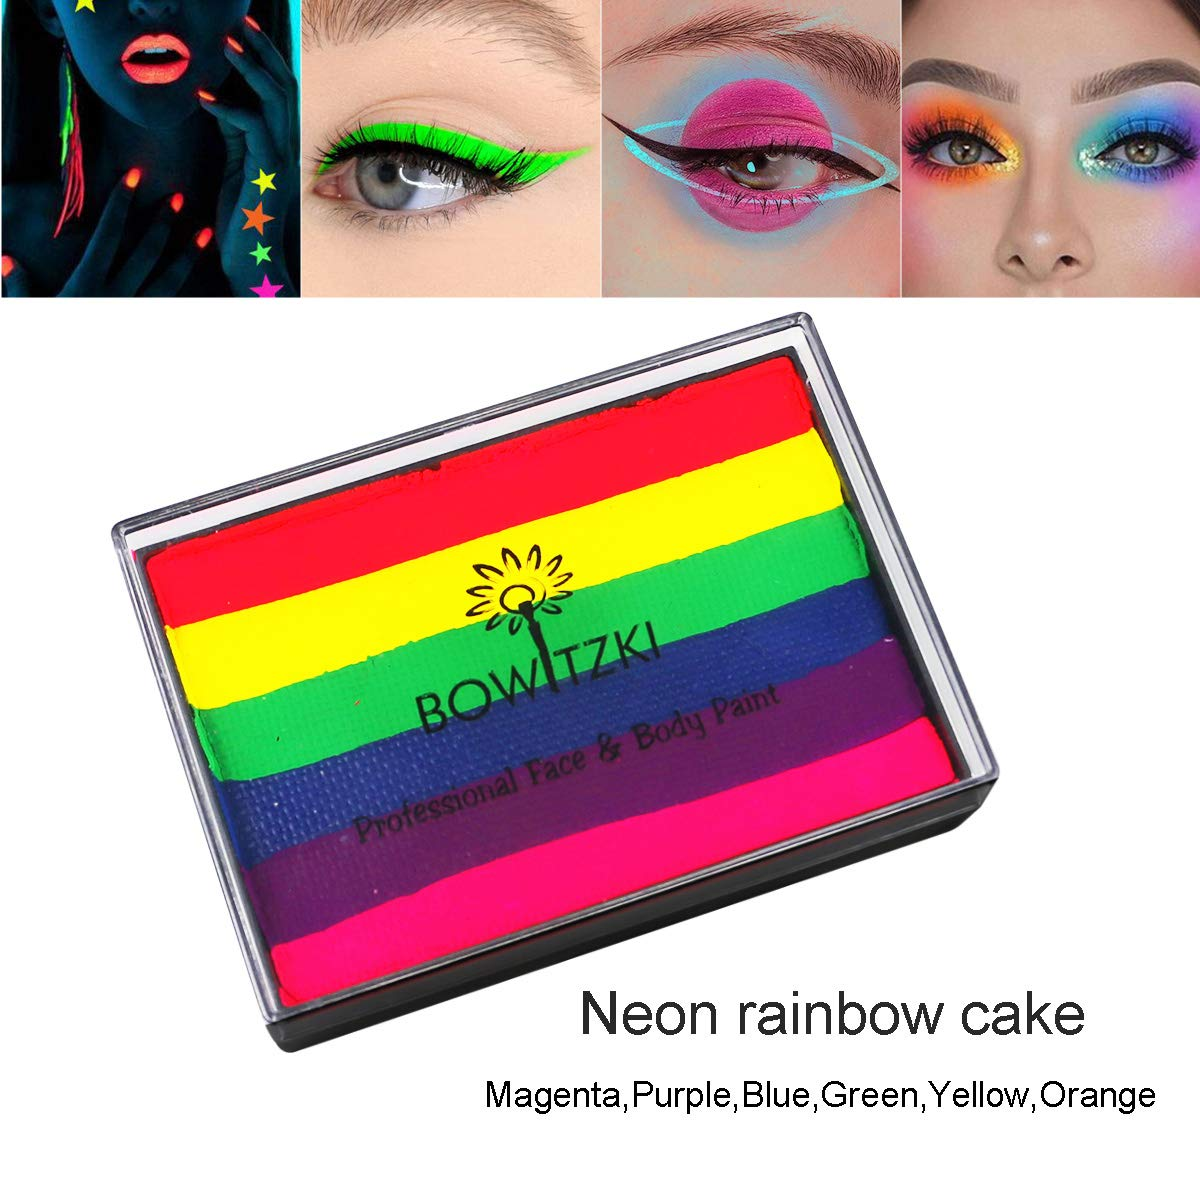 Bowitzki - Bowitzki UV Glow Split Cakes Neon Rainbow Water actived Face Paints Body Painting Makeup 50g